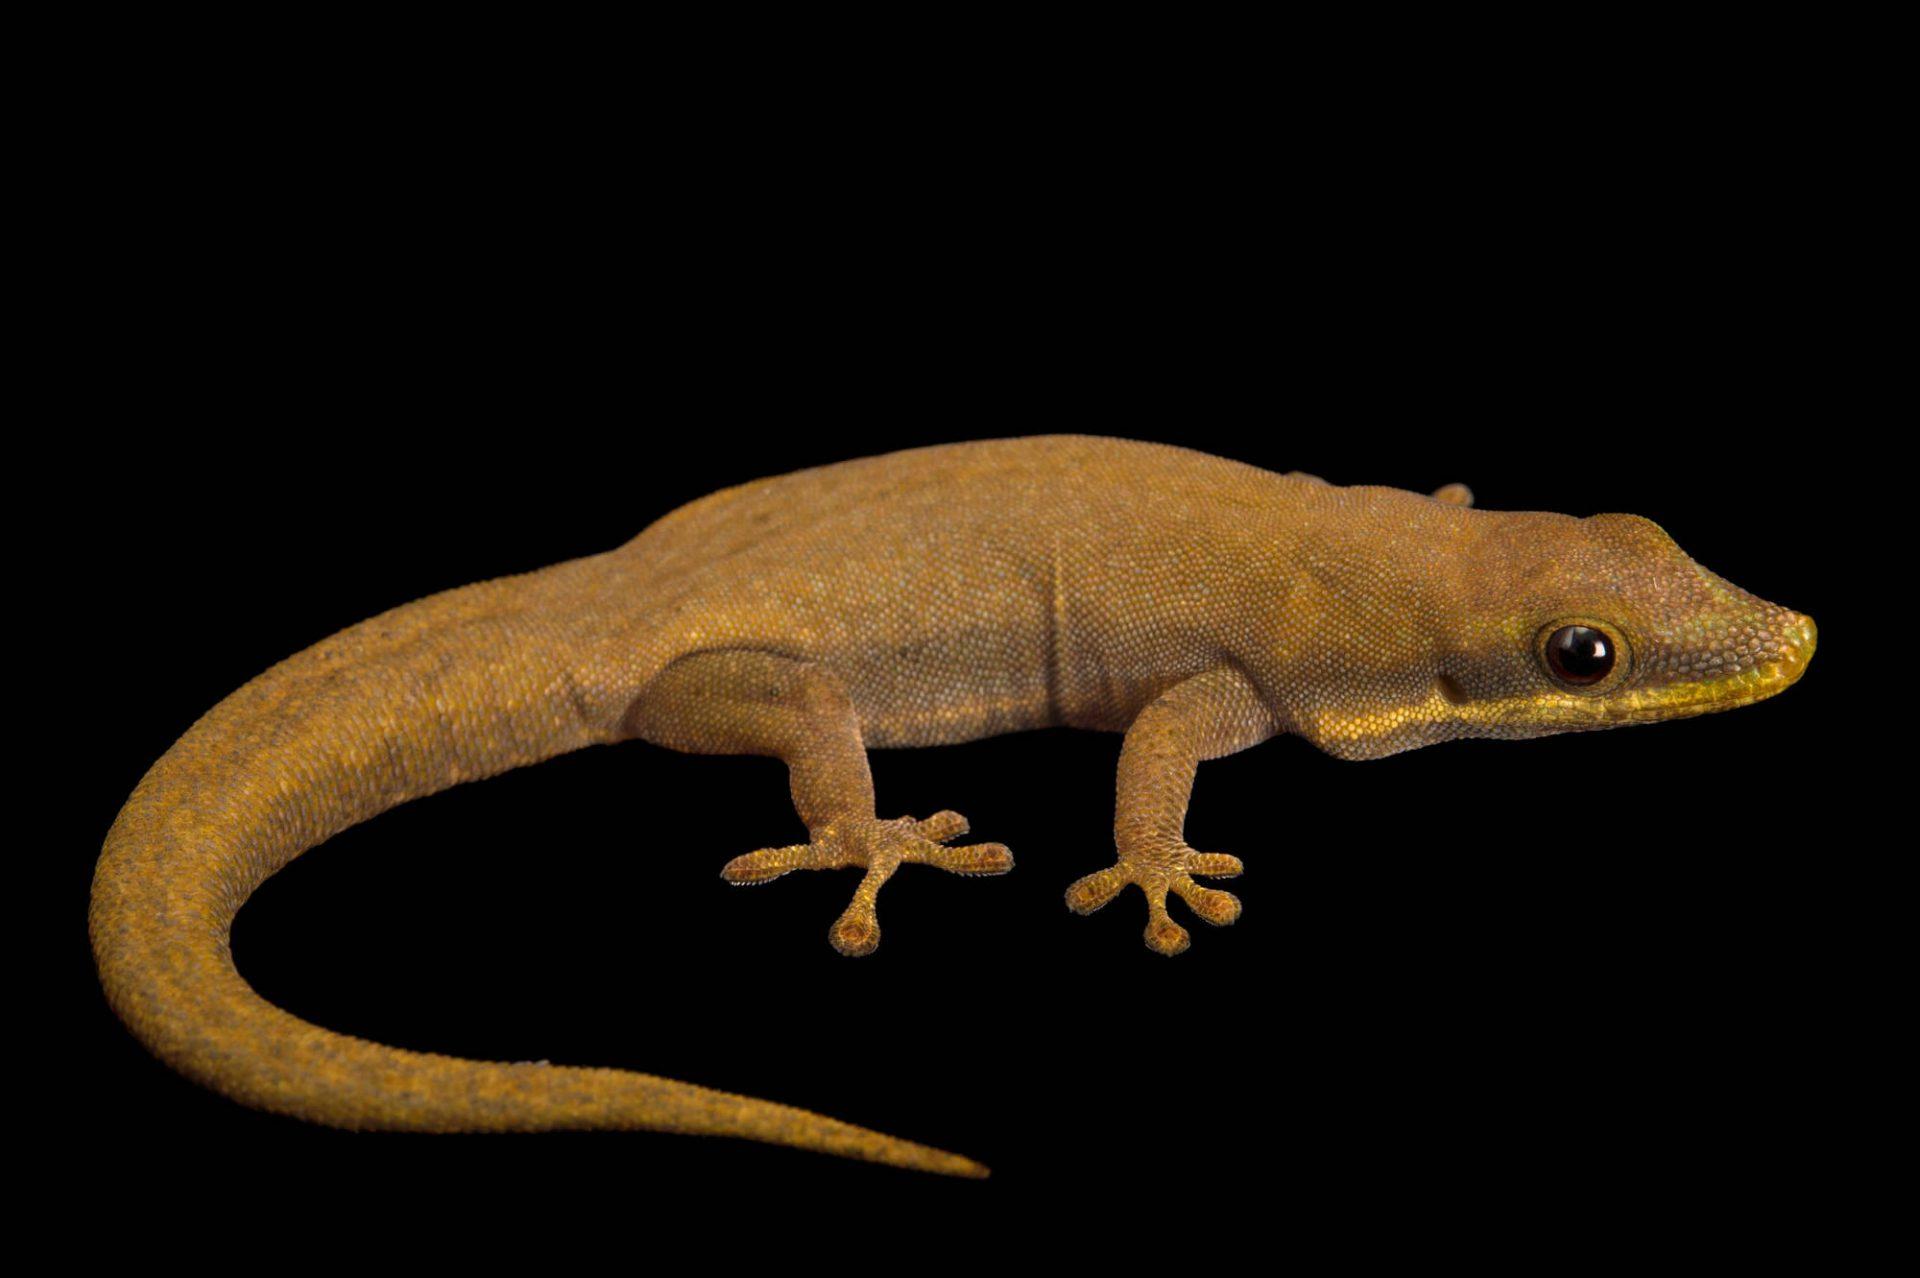 Photo: A modest day gecko (Phelsuma modesta isakae) at the Plzen Zoo.